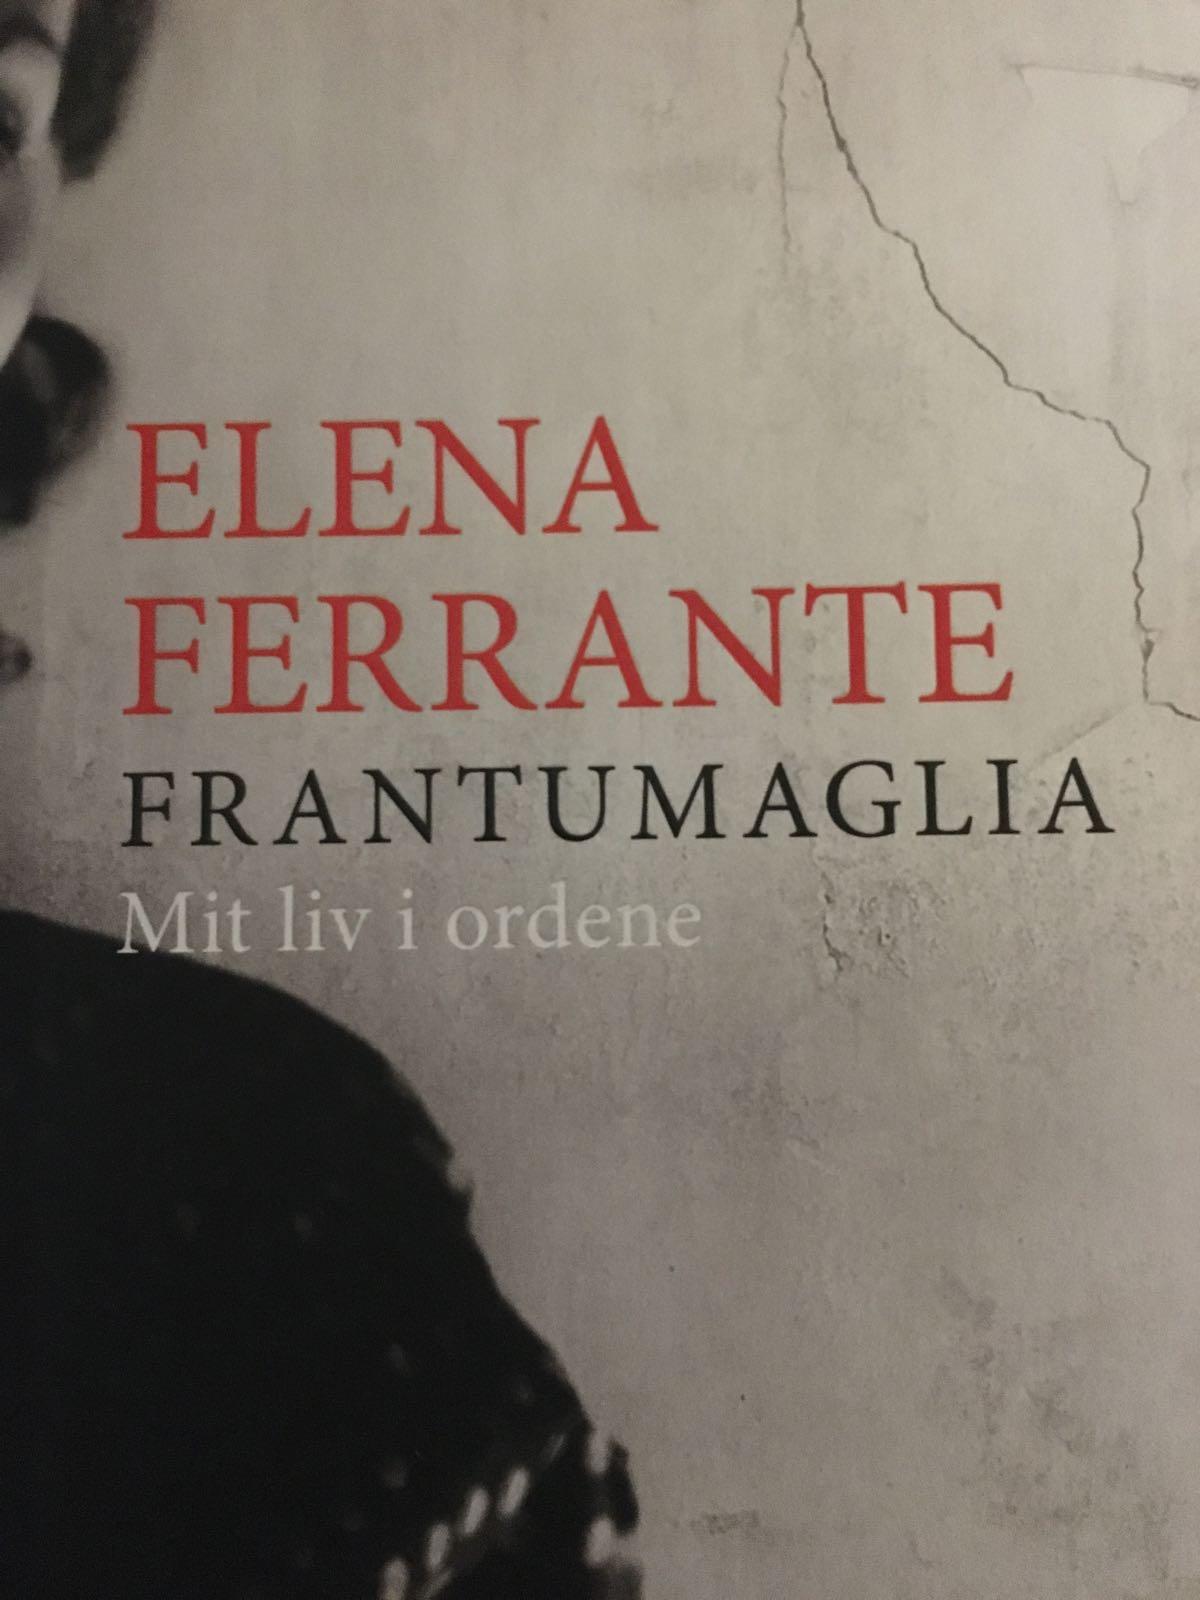 Frantumaglia. Mit i ordene af Elena Ferrante